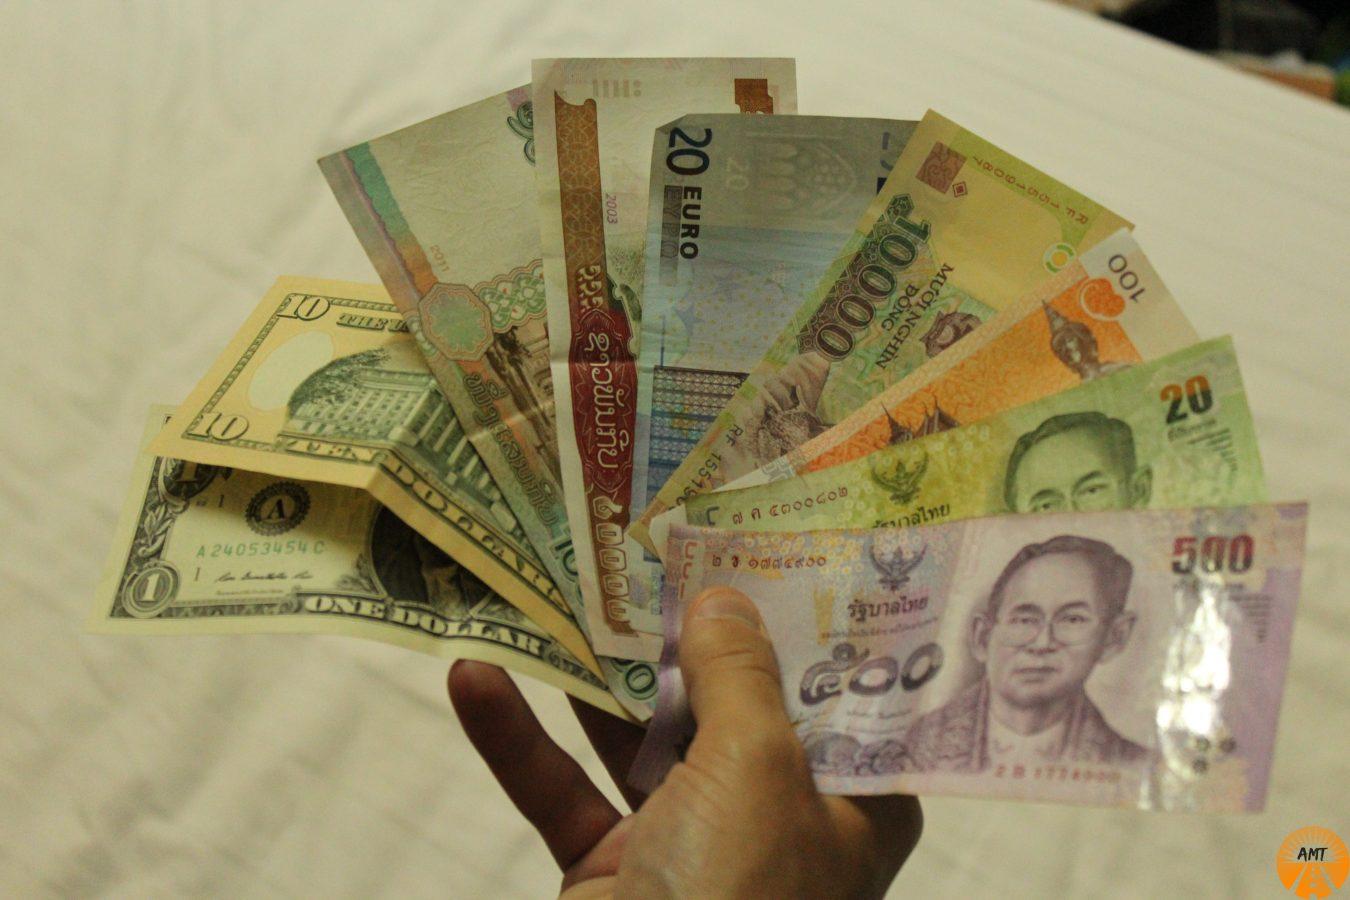 Lots of currencies!